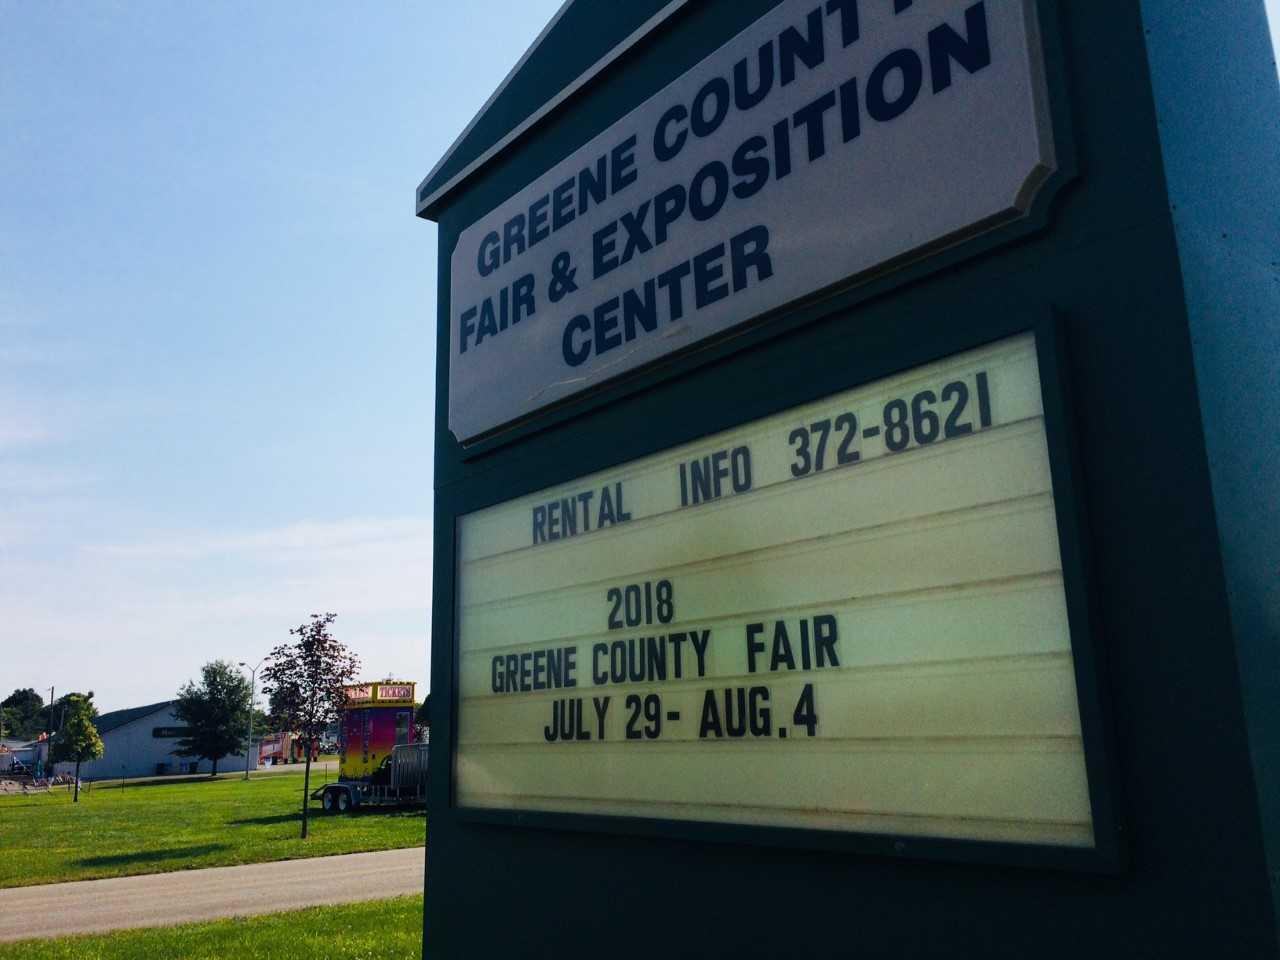 Greene County Fair_1532875057593.jfif.jpg